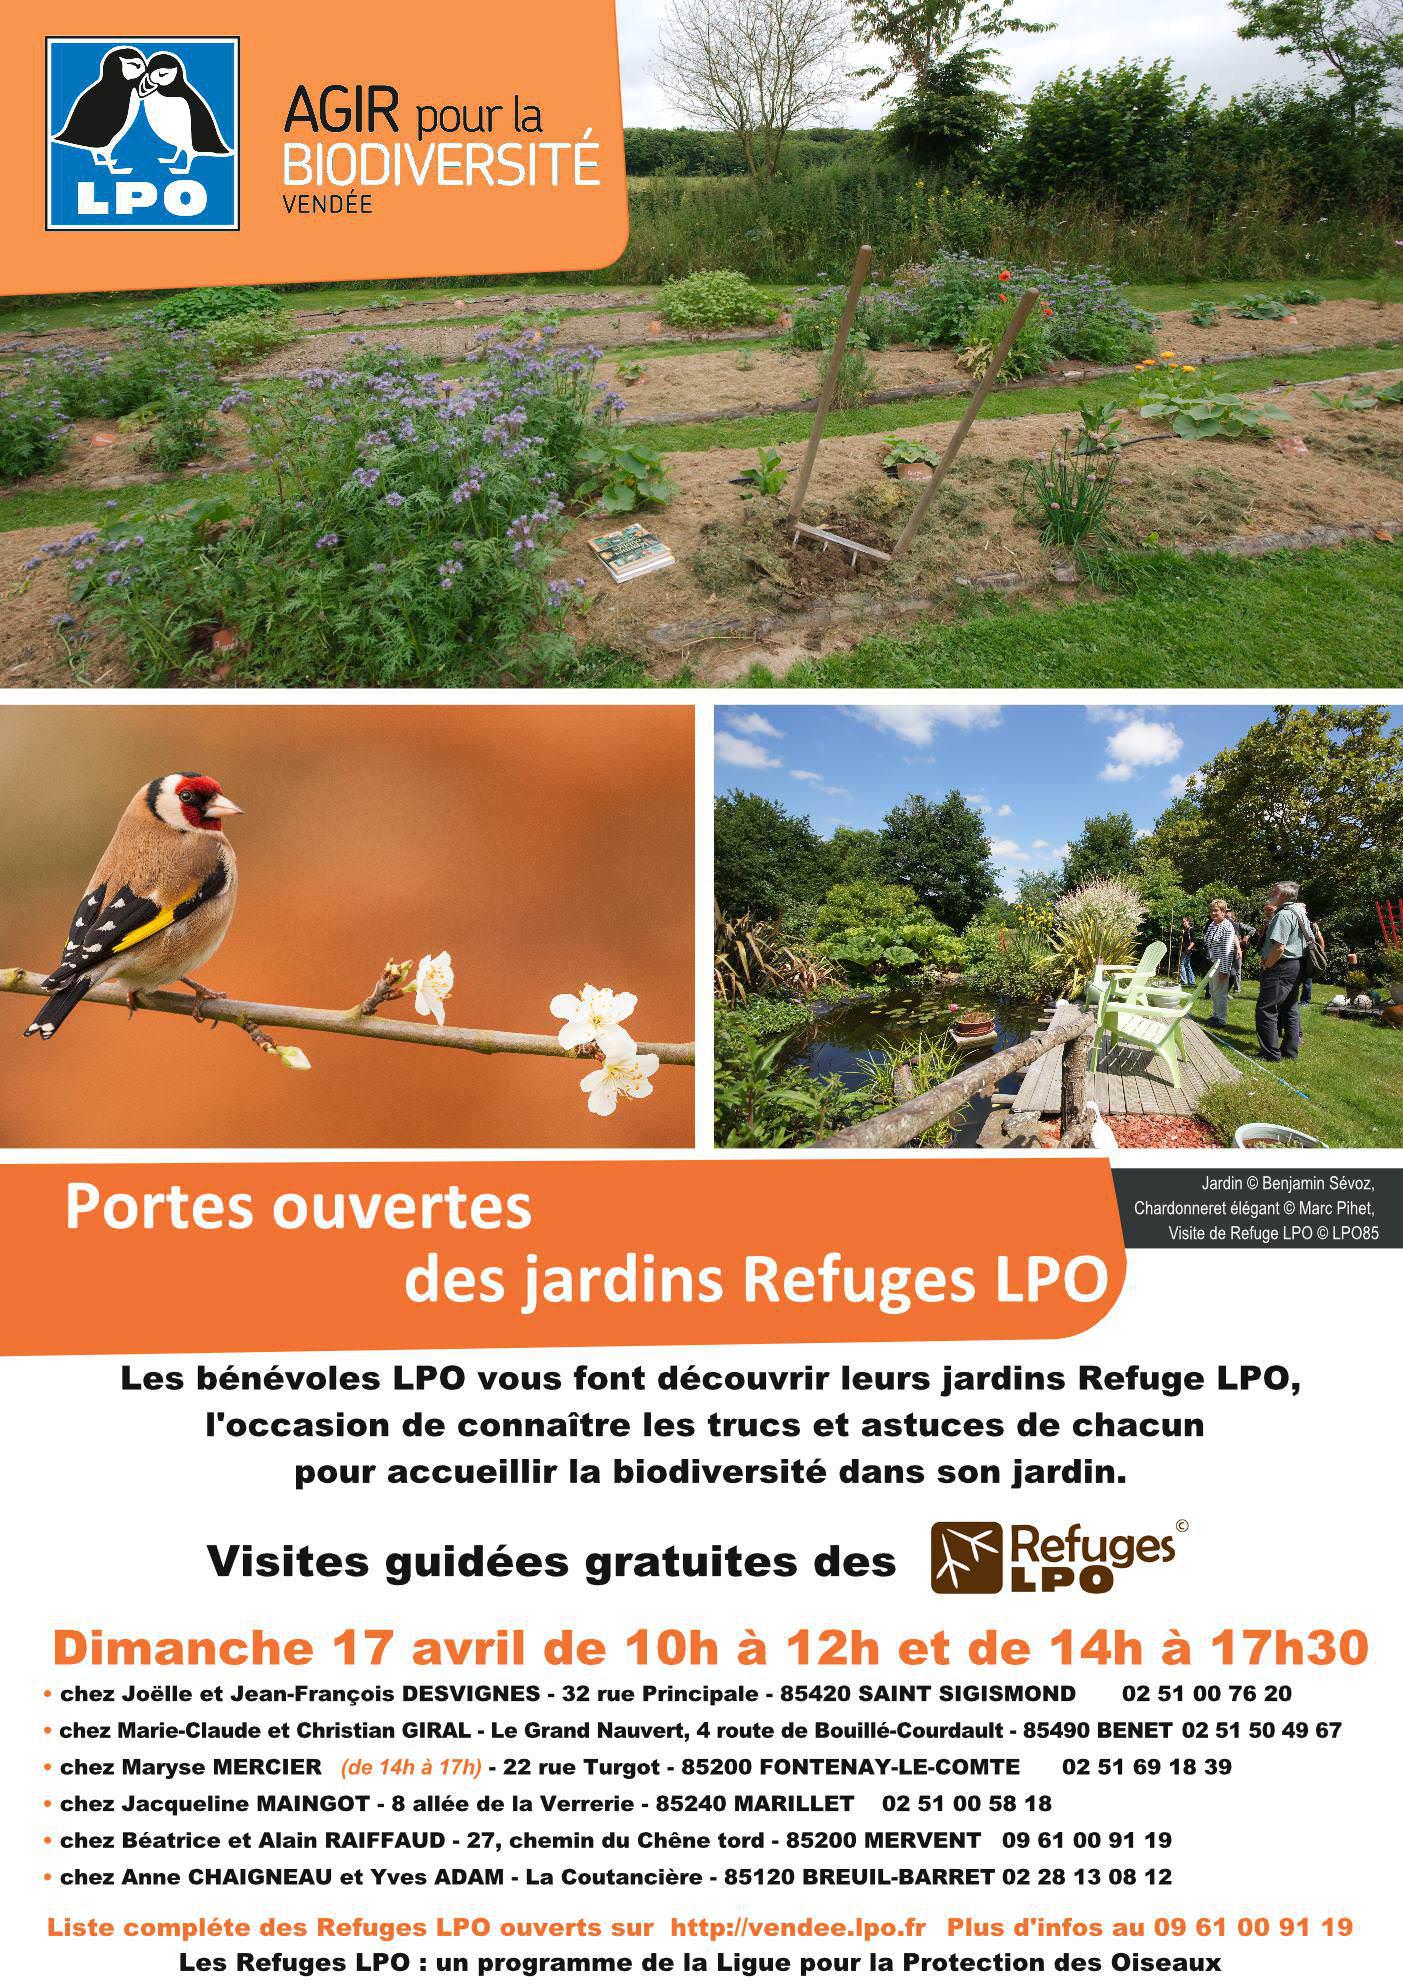 Portes ouvertes du jardin Refuge LPO de Joëlle et Jean-François